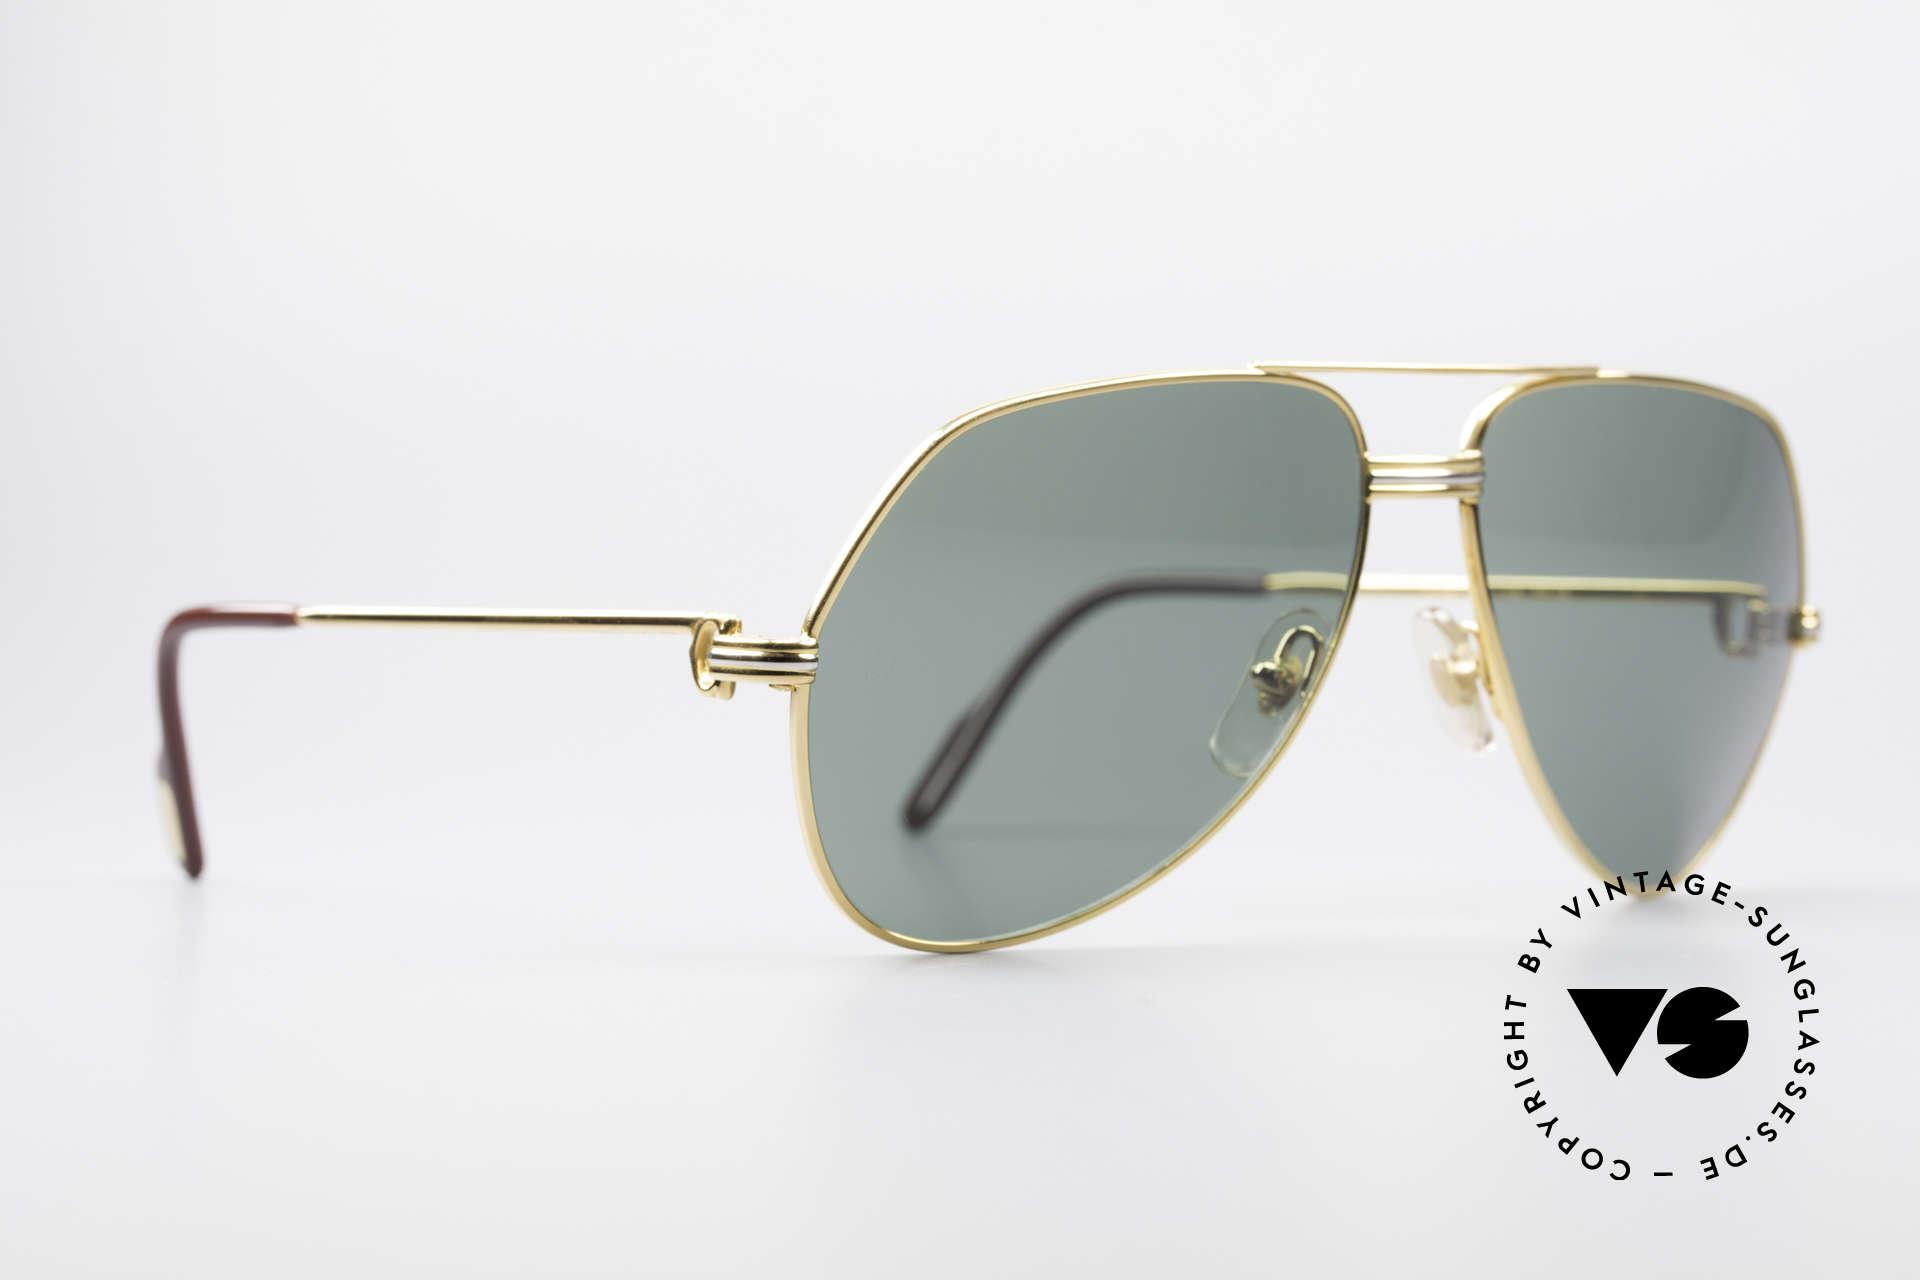 Cartier Vendome LC - M David Bowie Sunglasses, this pair (with L.Cartier decor): MEDIUM size 59-14,140, Made for Men